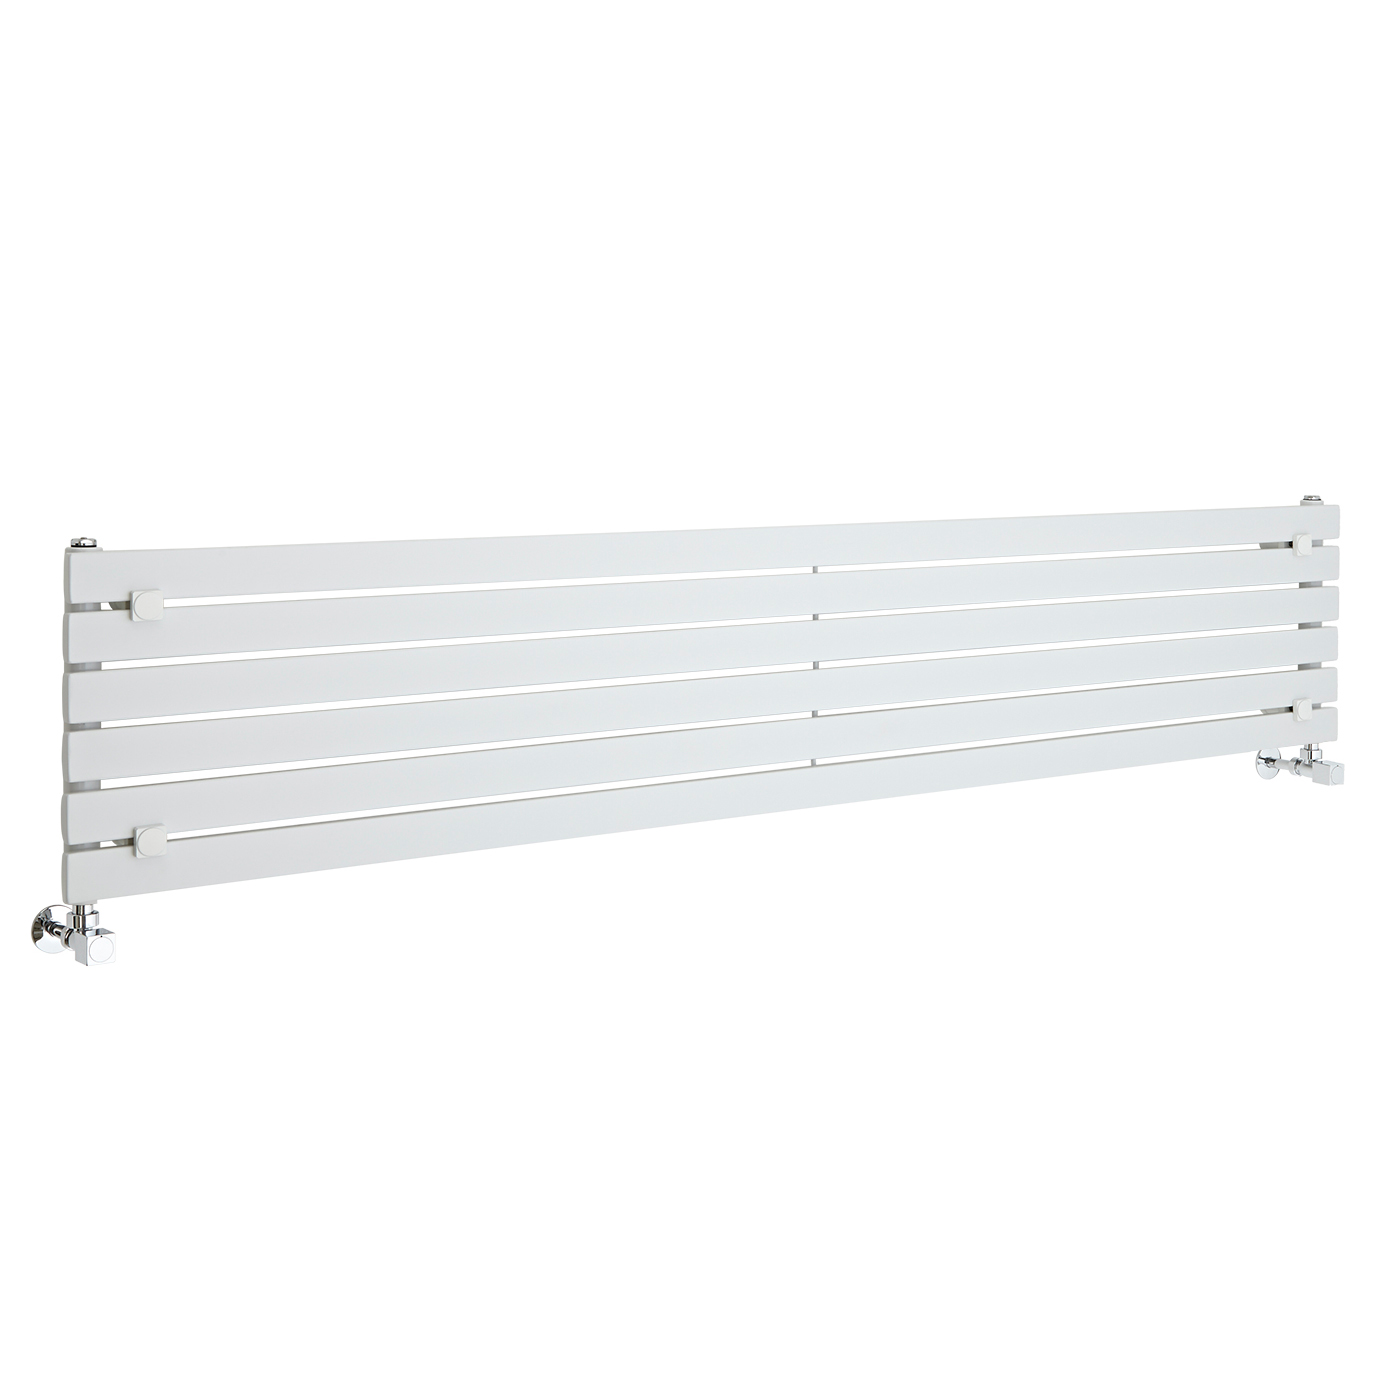 Radiateur Design Horizontal Blanc Sloane 35,4cm x 178cm x 5,4cm 821 Watts